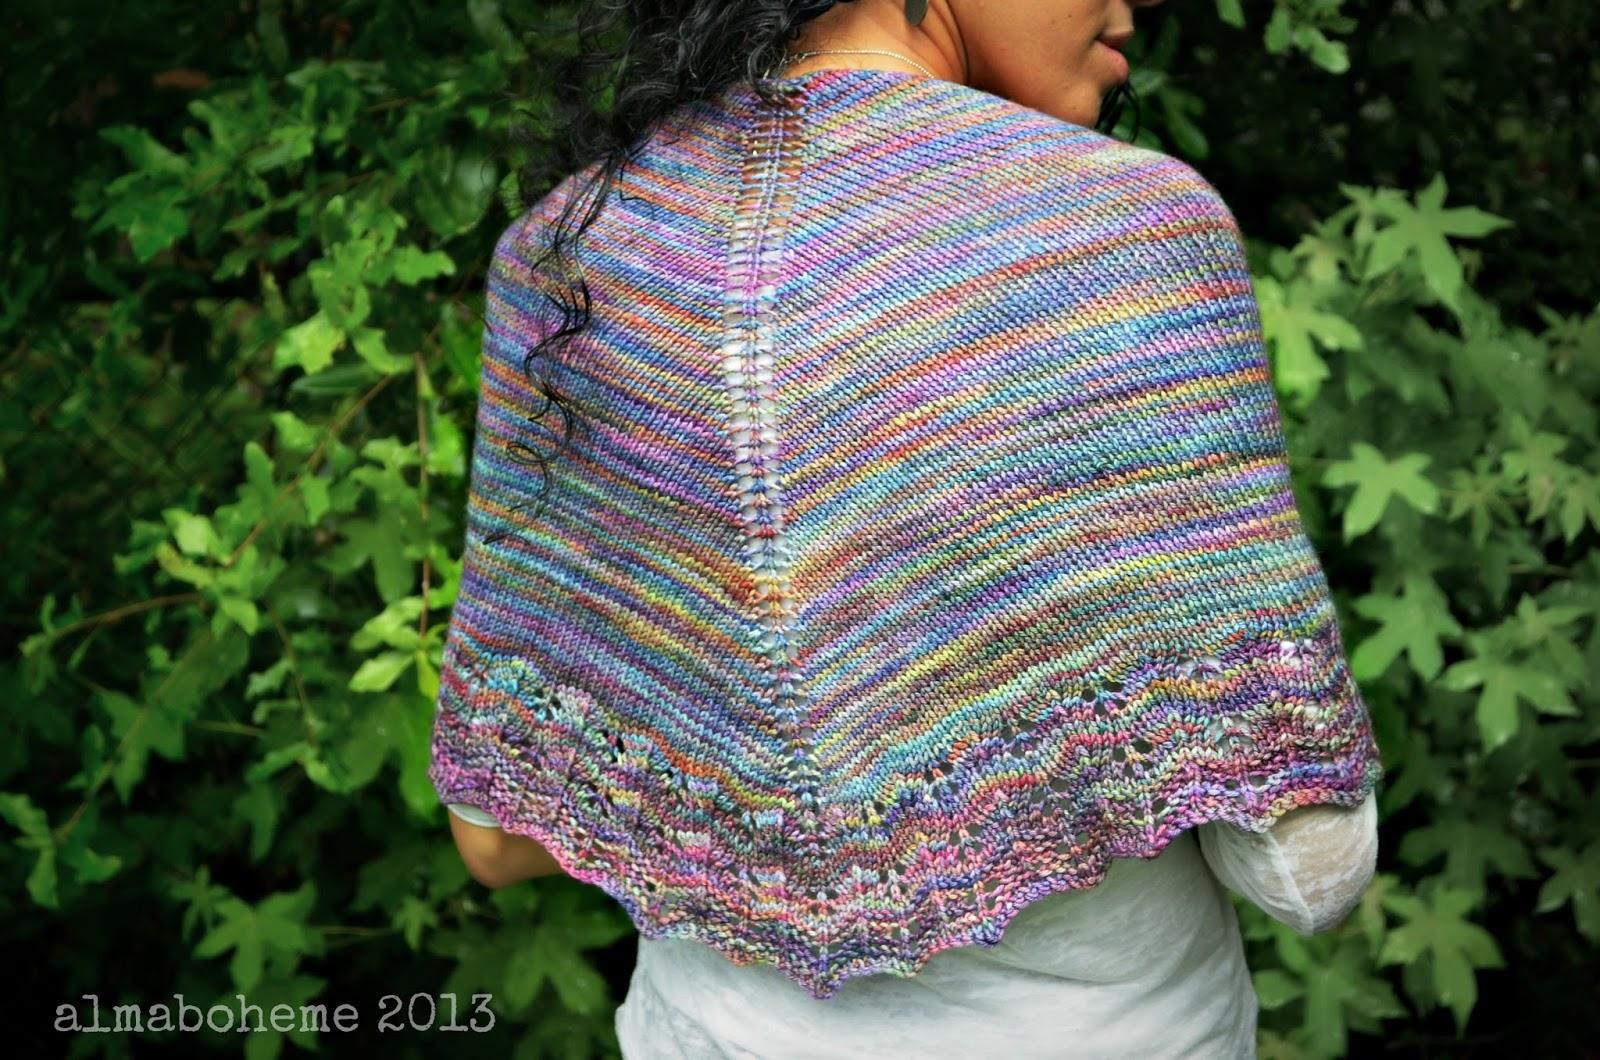 Knitting Shawl : Lacy knit shawl alma boheme